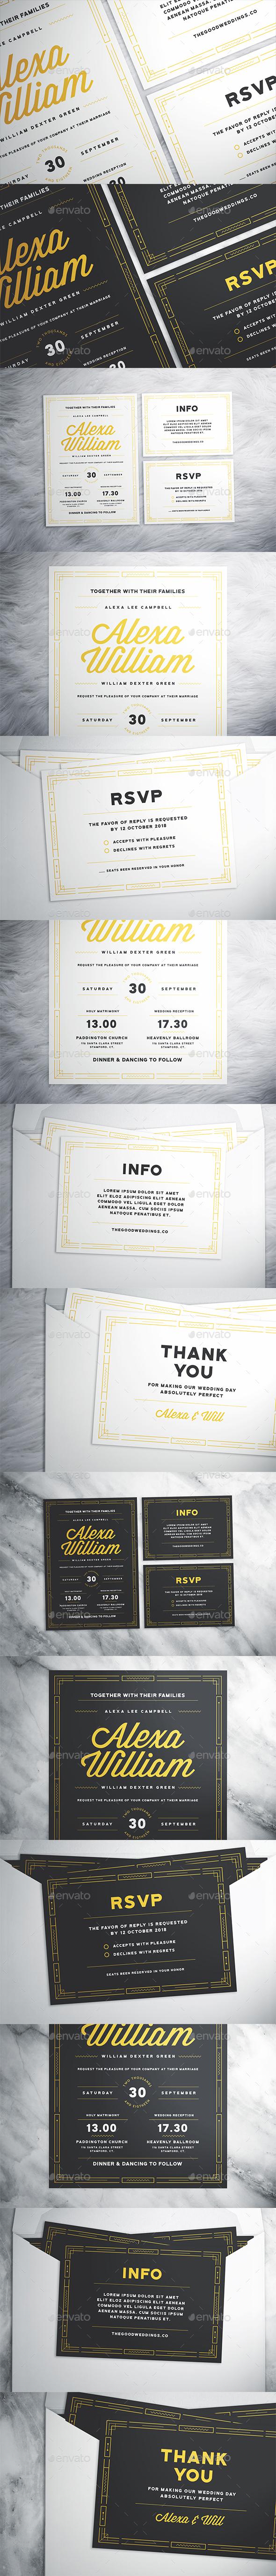 Modern Wedding Suite - Invitations Cards & Invites